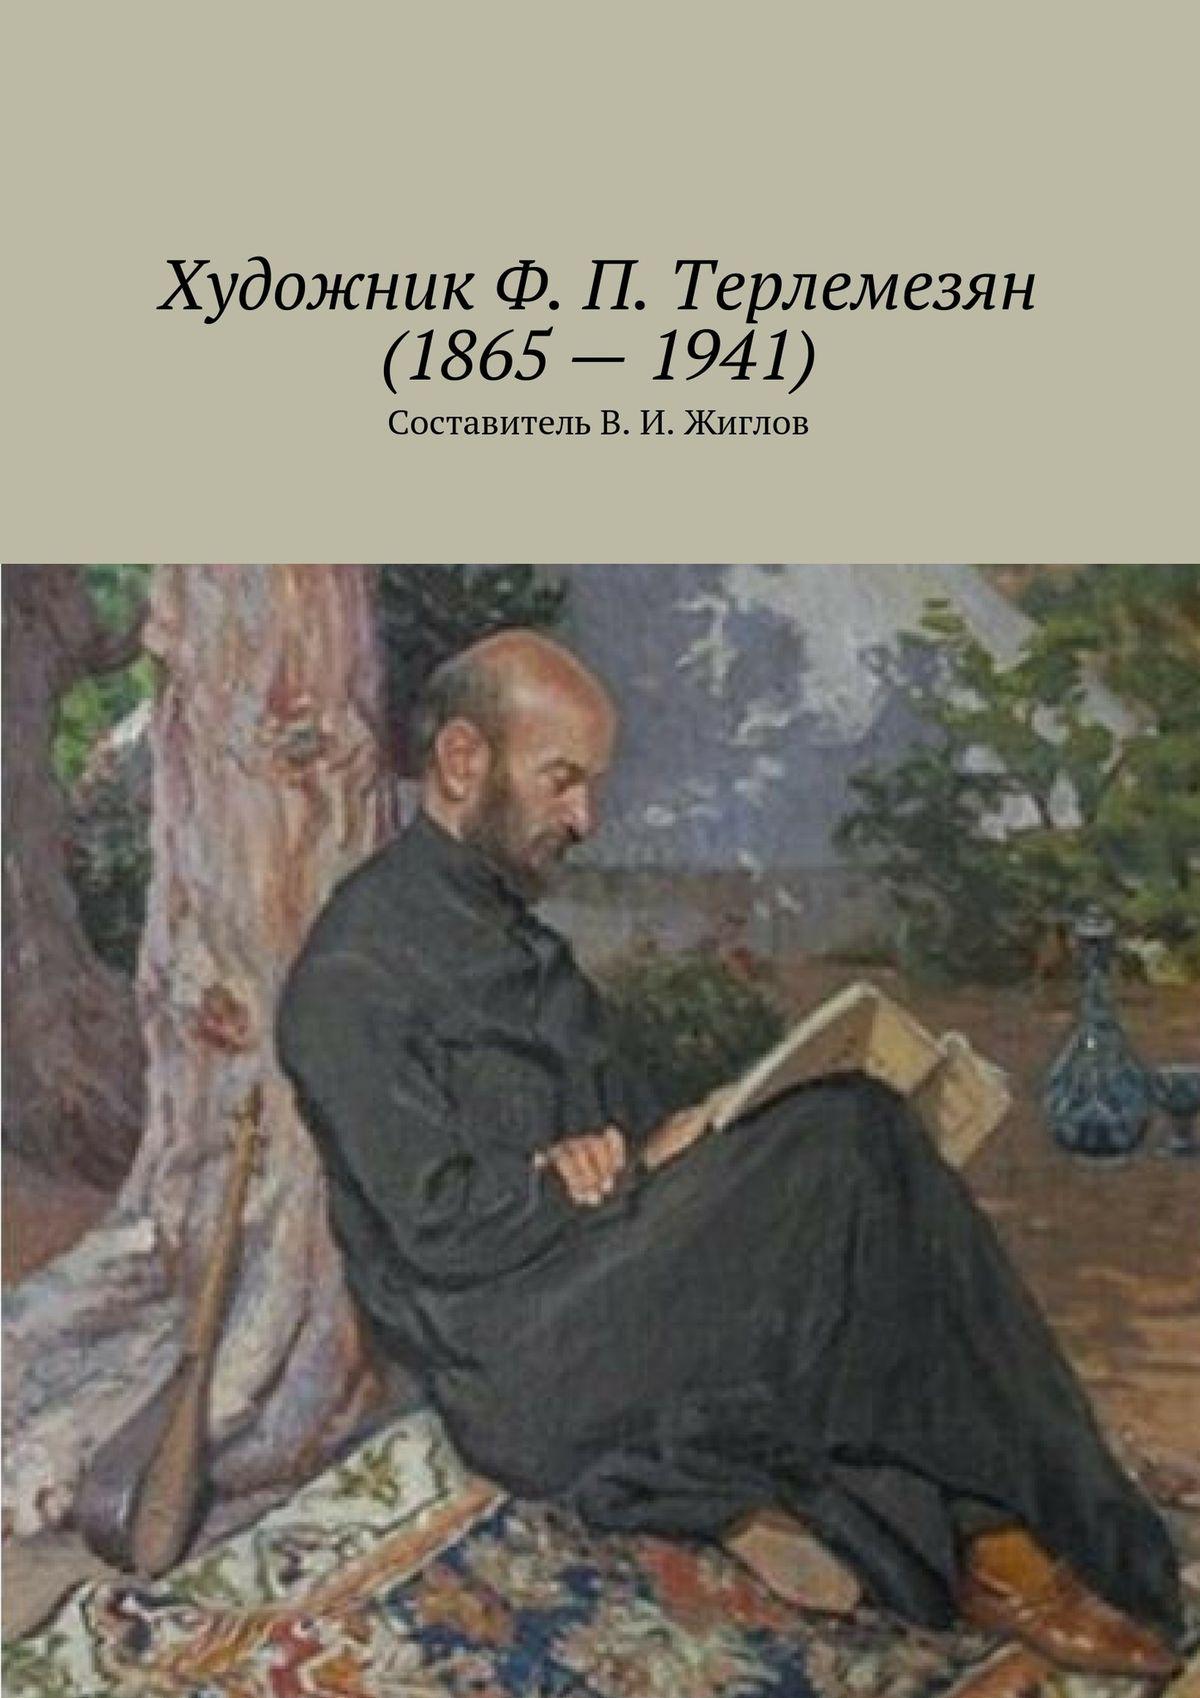 Художник Ф. П. Терлемезян(1865–1941)